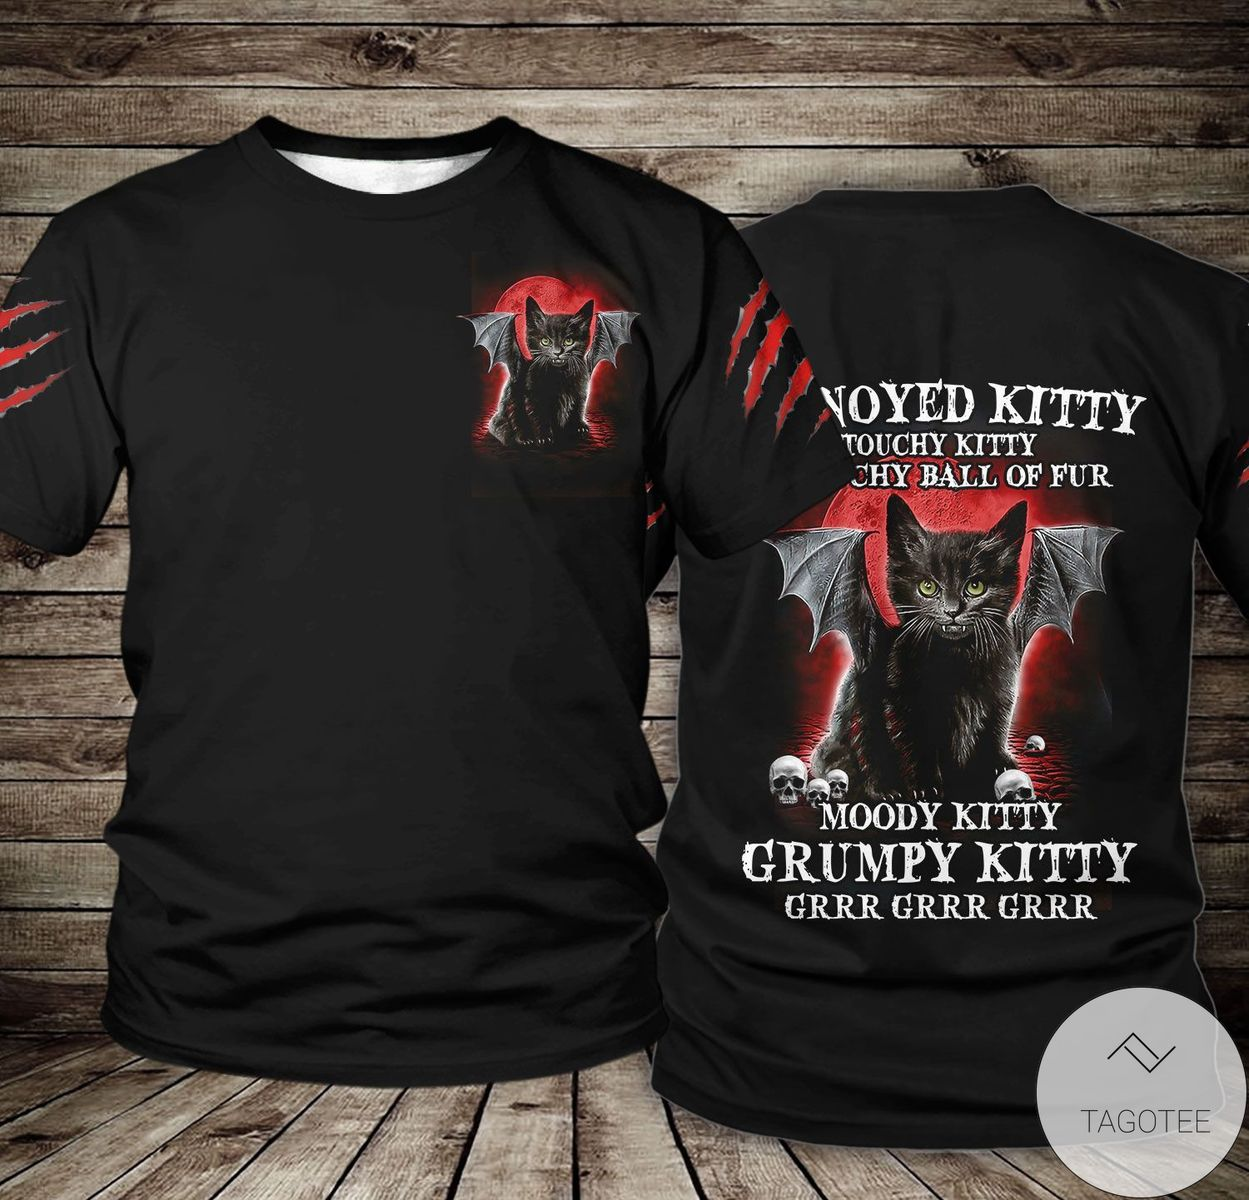 Annoyed Kitty Touchy Kitty Grouchy Ball Of Fur Halloween 3D T-shirt